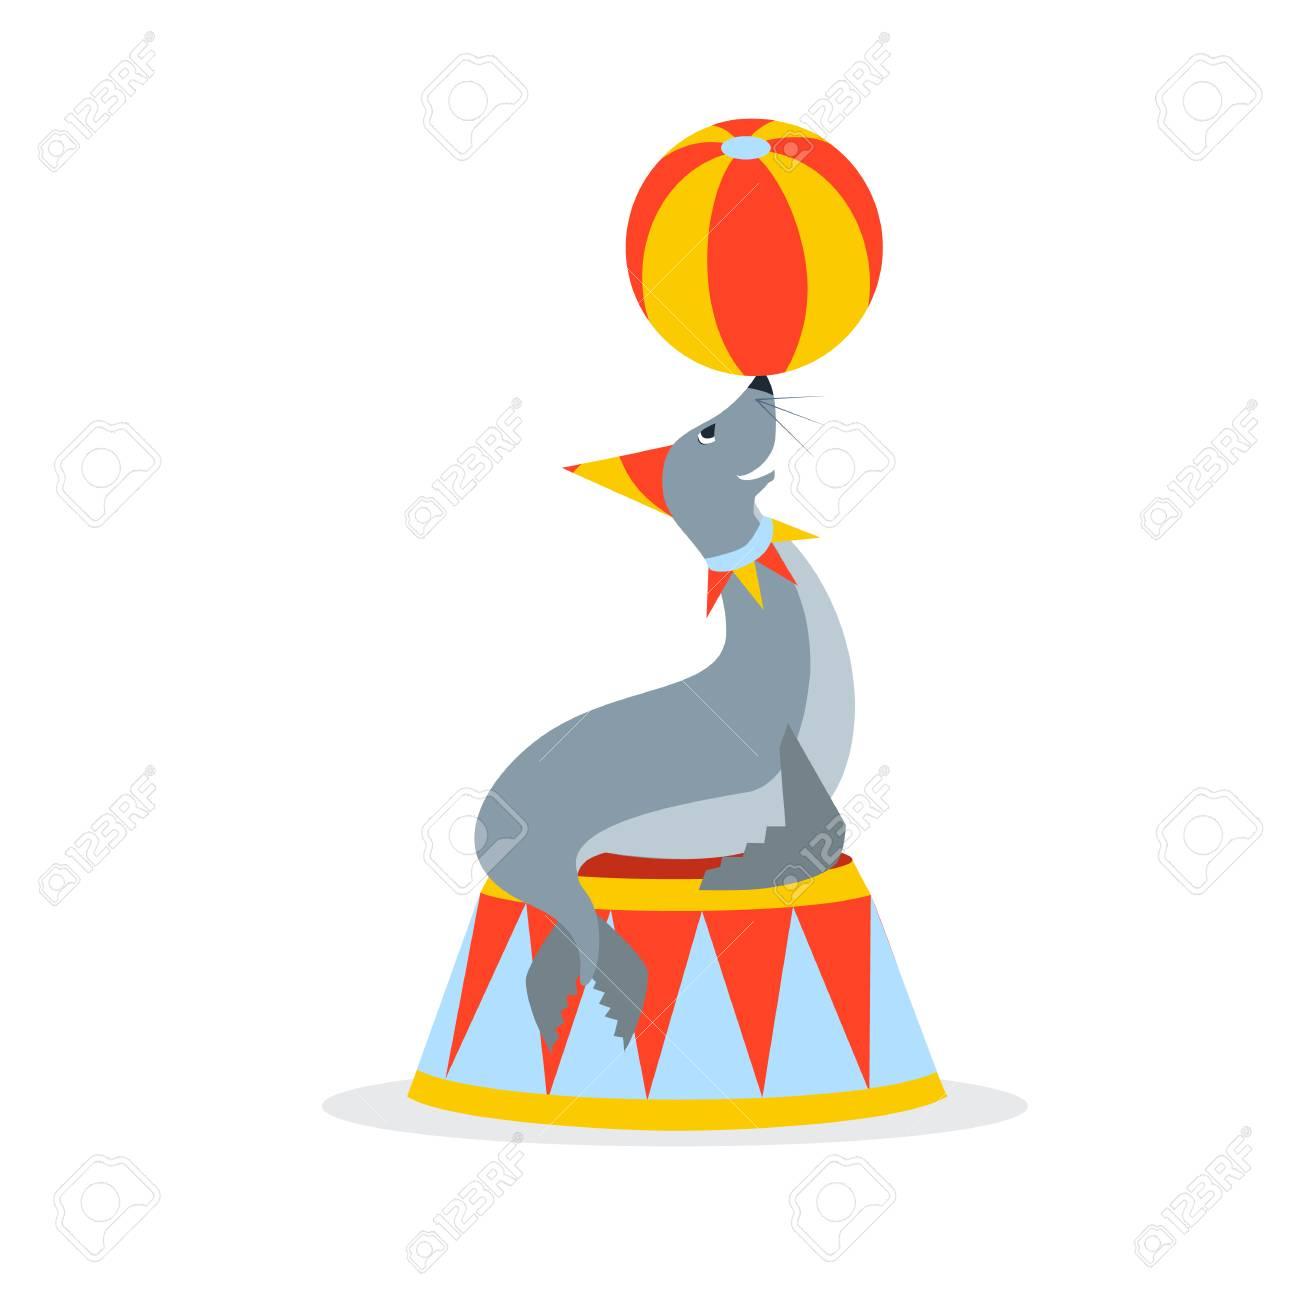 Name:  91114955-circus-sea-seal-standing-on-the-podium-and-balancing-with-a-big-ball-on-the-nose- (1).jpg Views: 48 Size:  57.2 KB